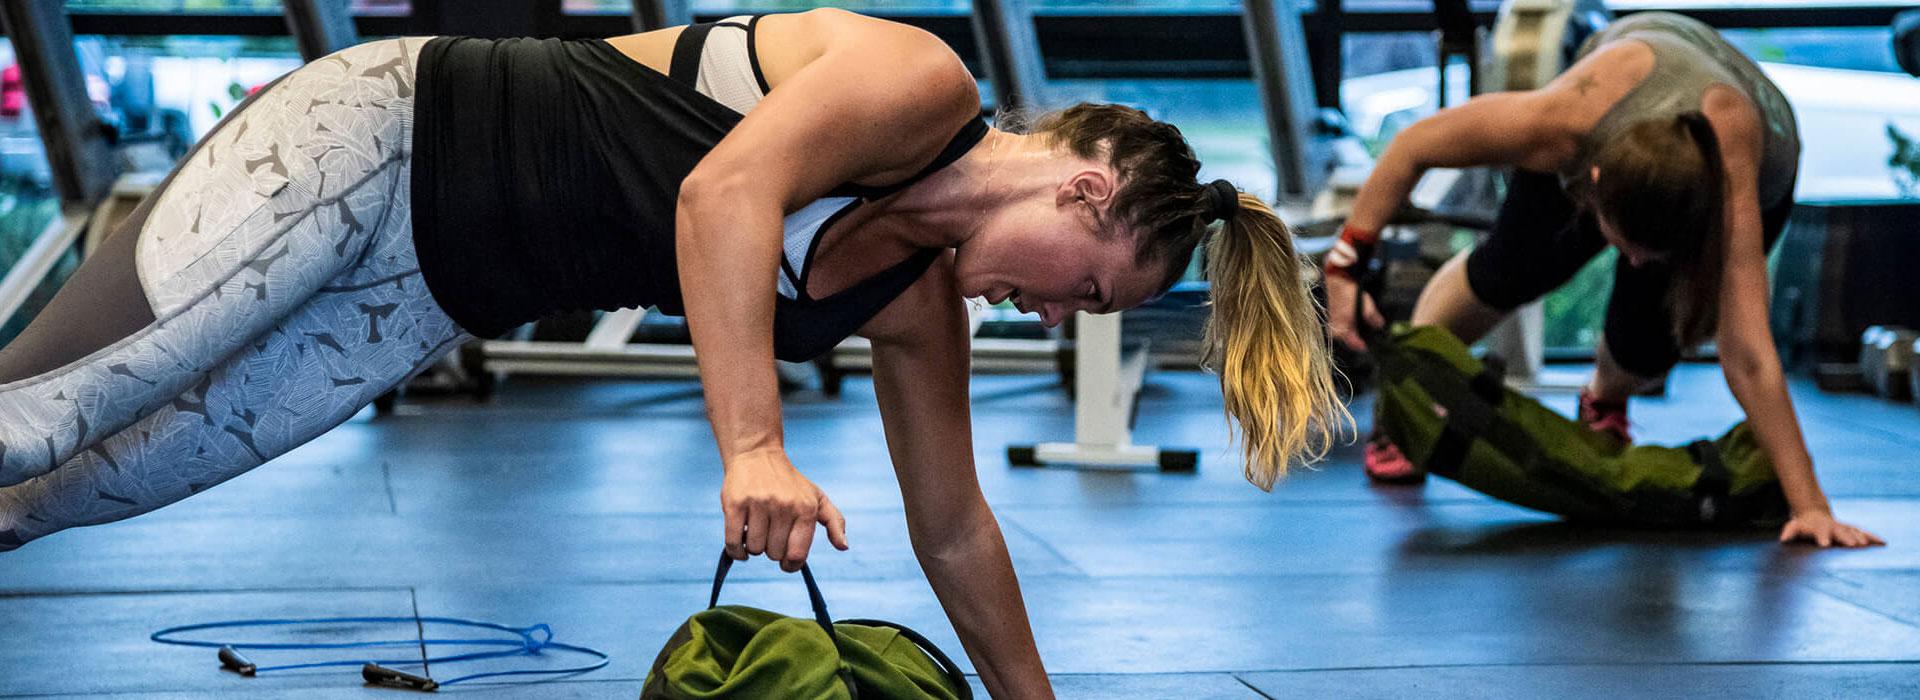 CrossFit Gym in Basalt CO, CrossFit Gym near El Jebel CO, CrossFit Gym near Snowmass CO, CrossFit Gym near Carbondale CO, CrossFit Gym near Woody Creek CO, CrossFit Gym near Aspen CO